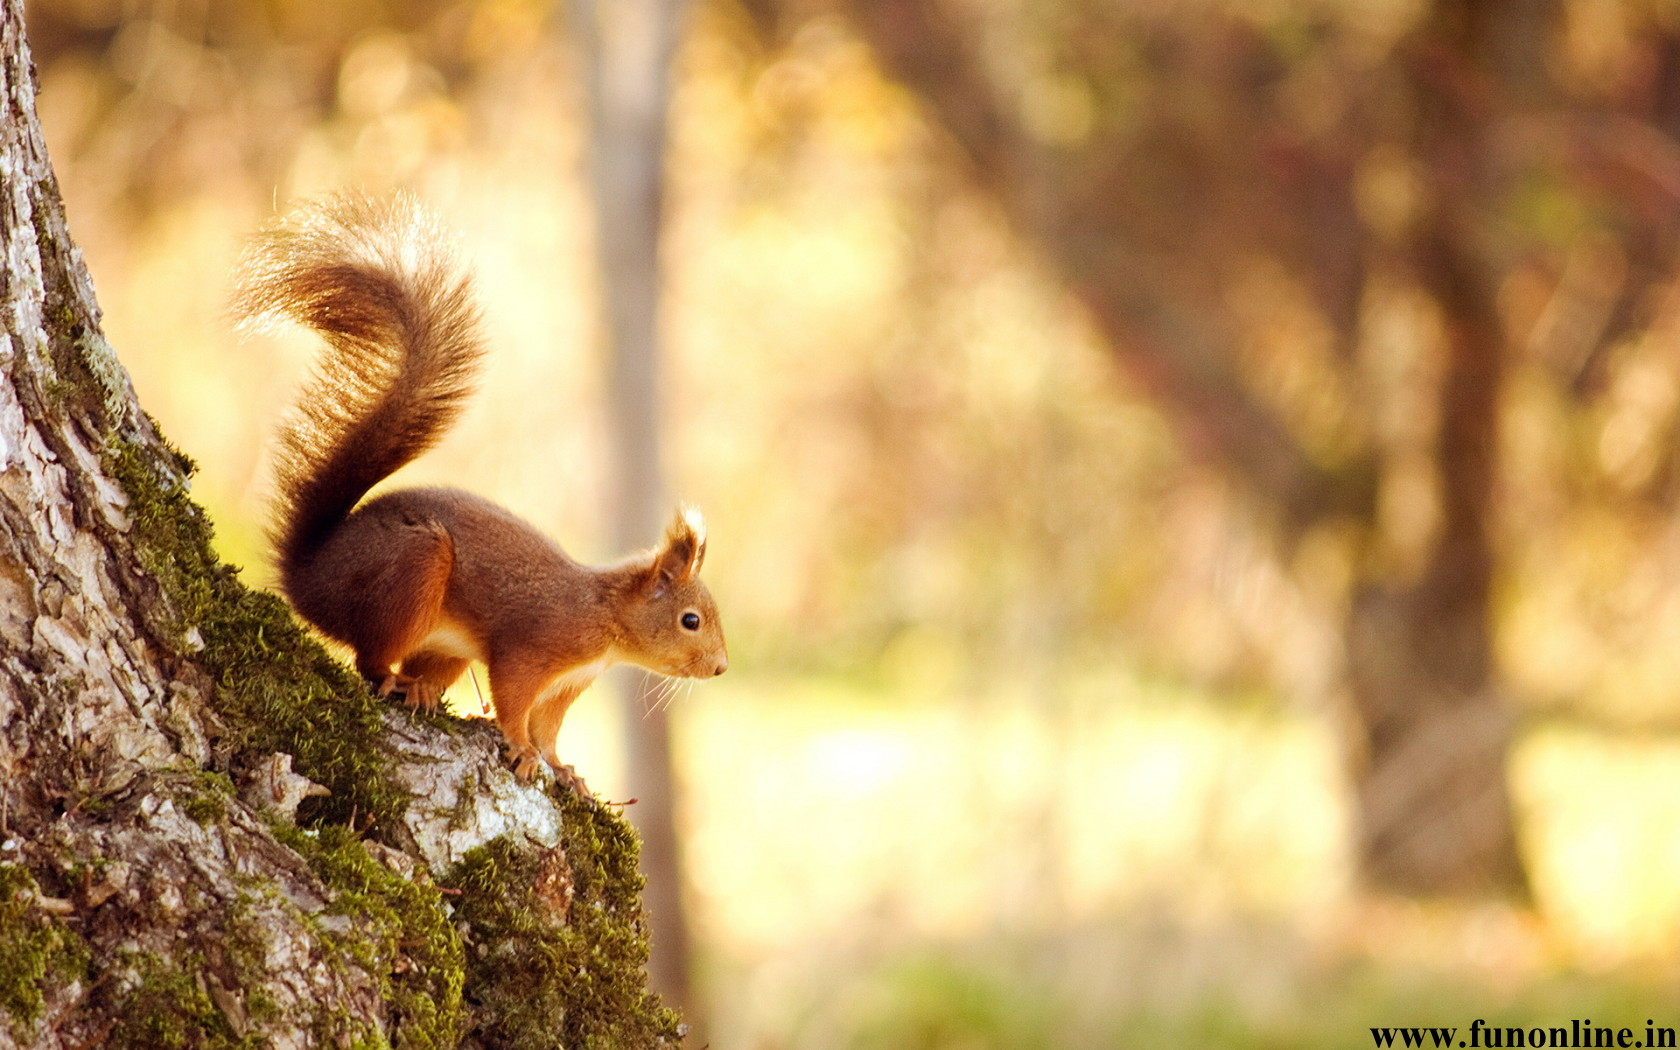 Squirrel Wallpapers Download Charming Squirrels HD Wallpaper 1680x1050